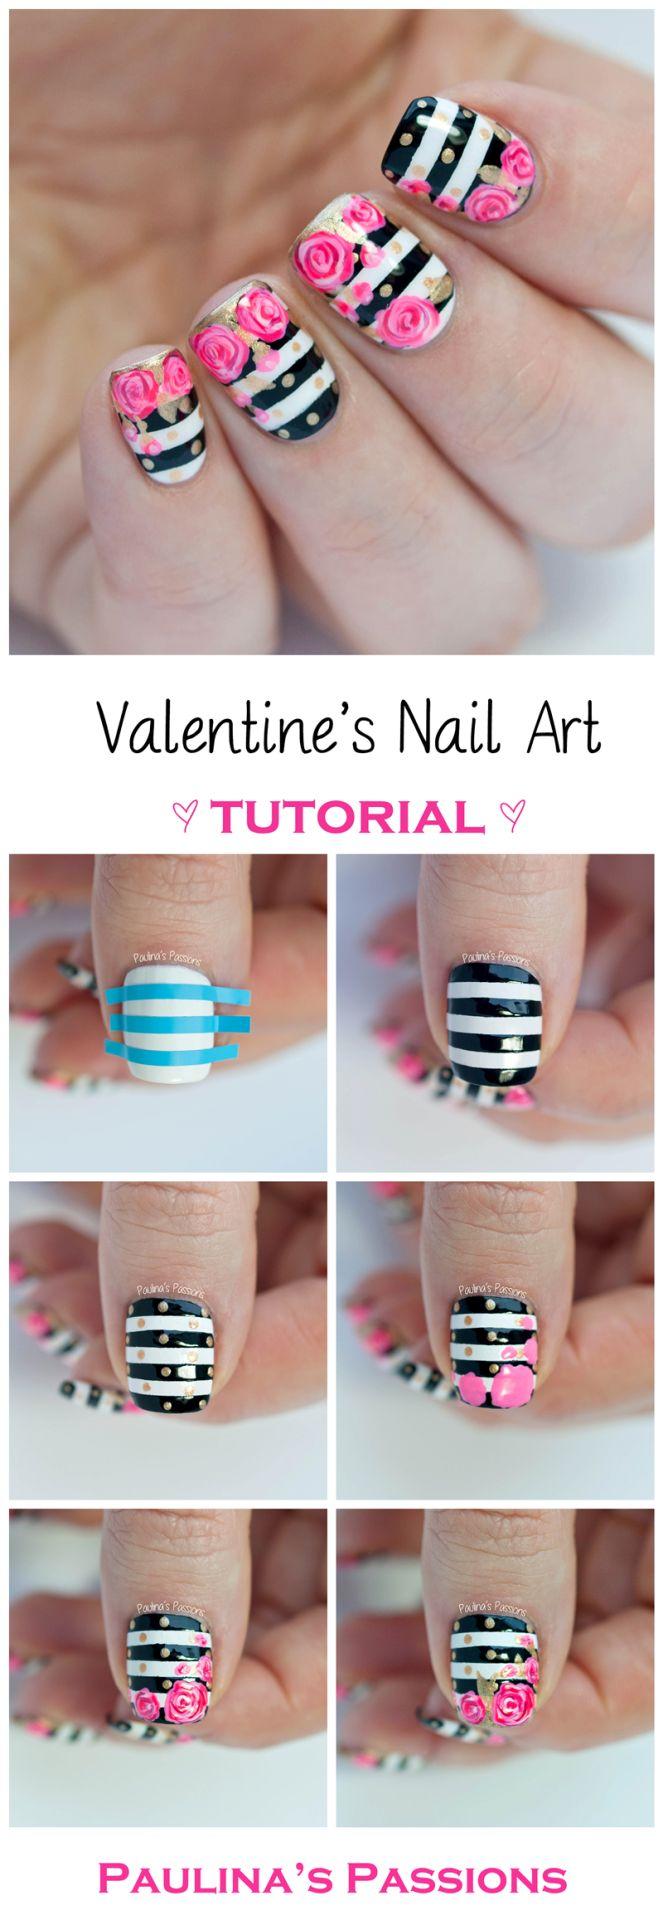 Valentine's Nail Art tutorial on the blog: http://paulinaspassions.com/valentines-roses-nail-art-tutorial/